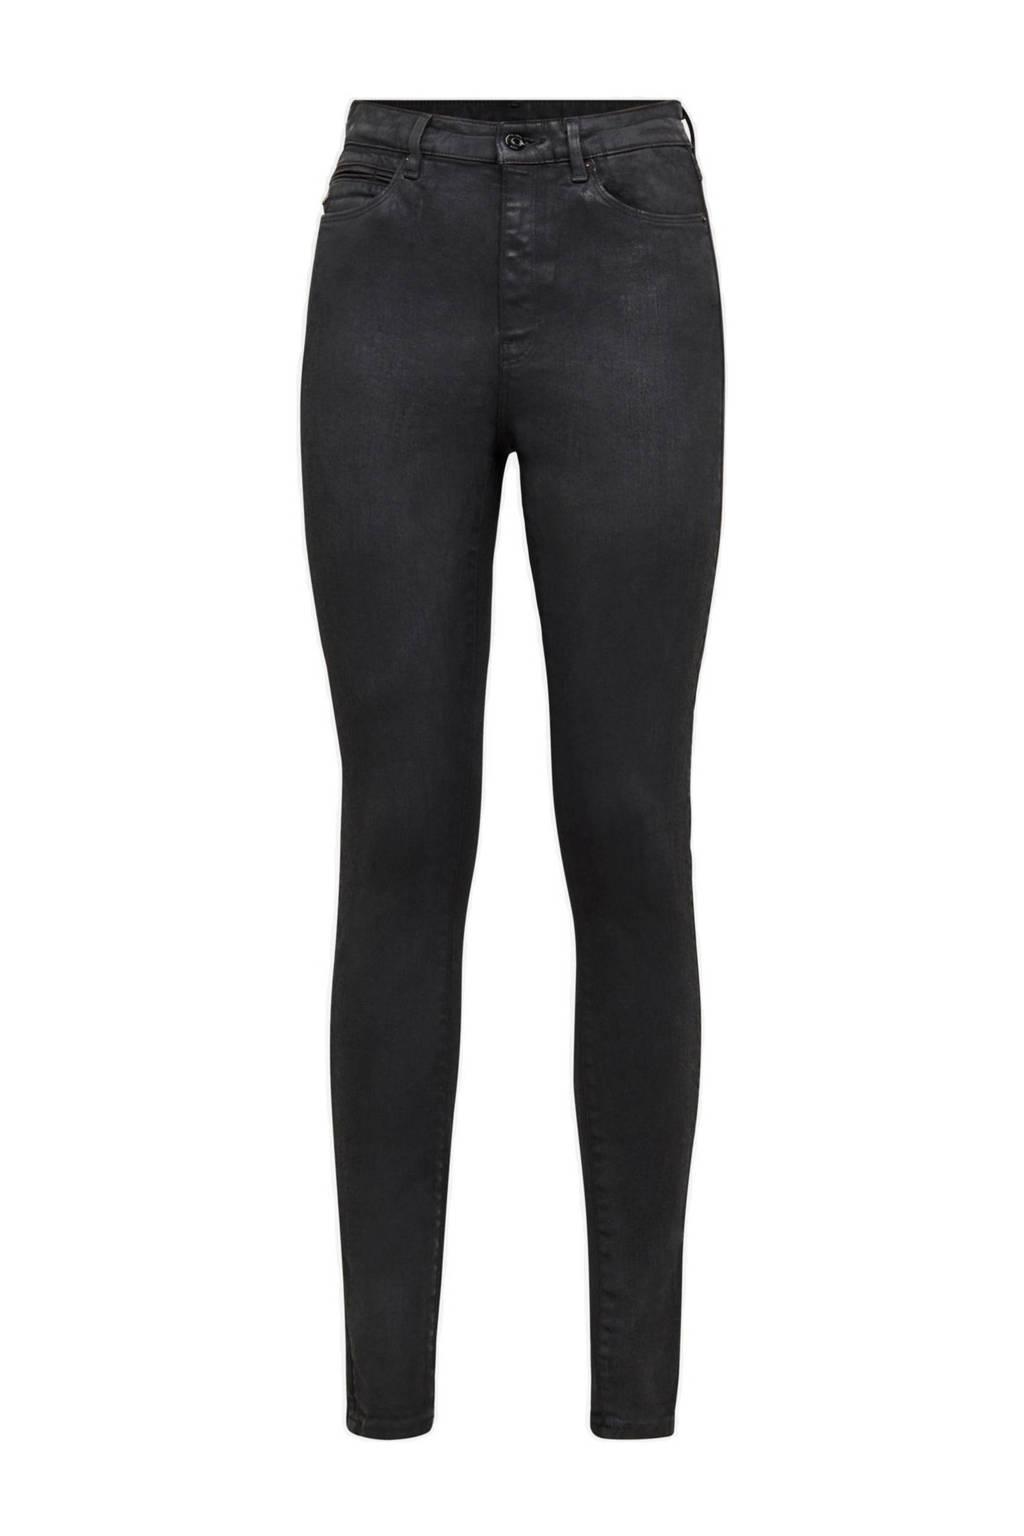 G-Star RAW high waist super skinny jeans Shape met studs black obsidian cobler